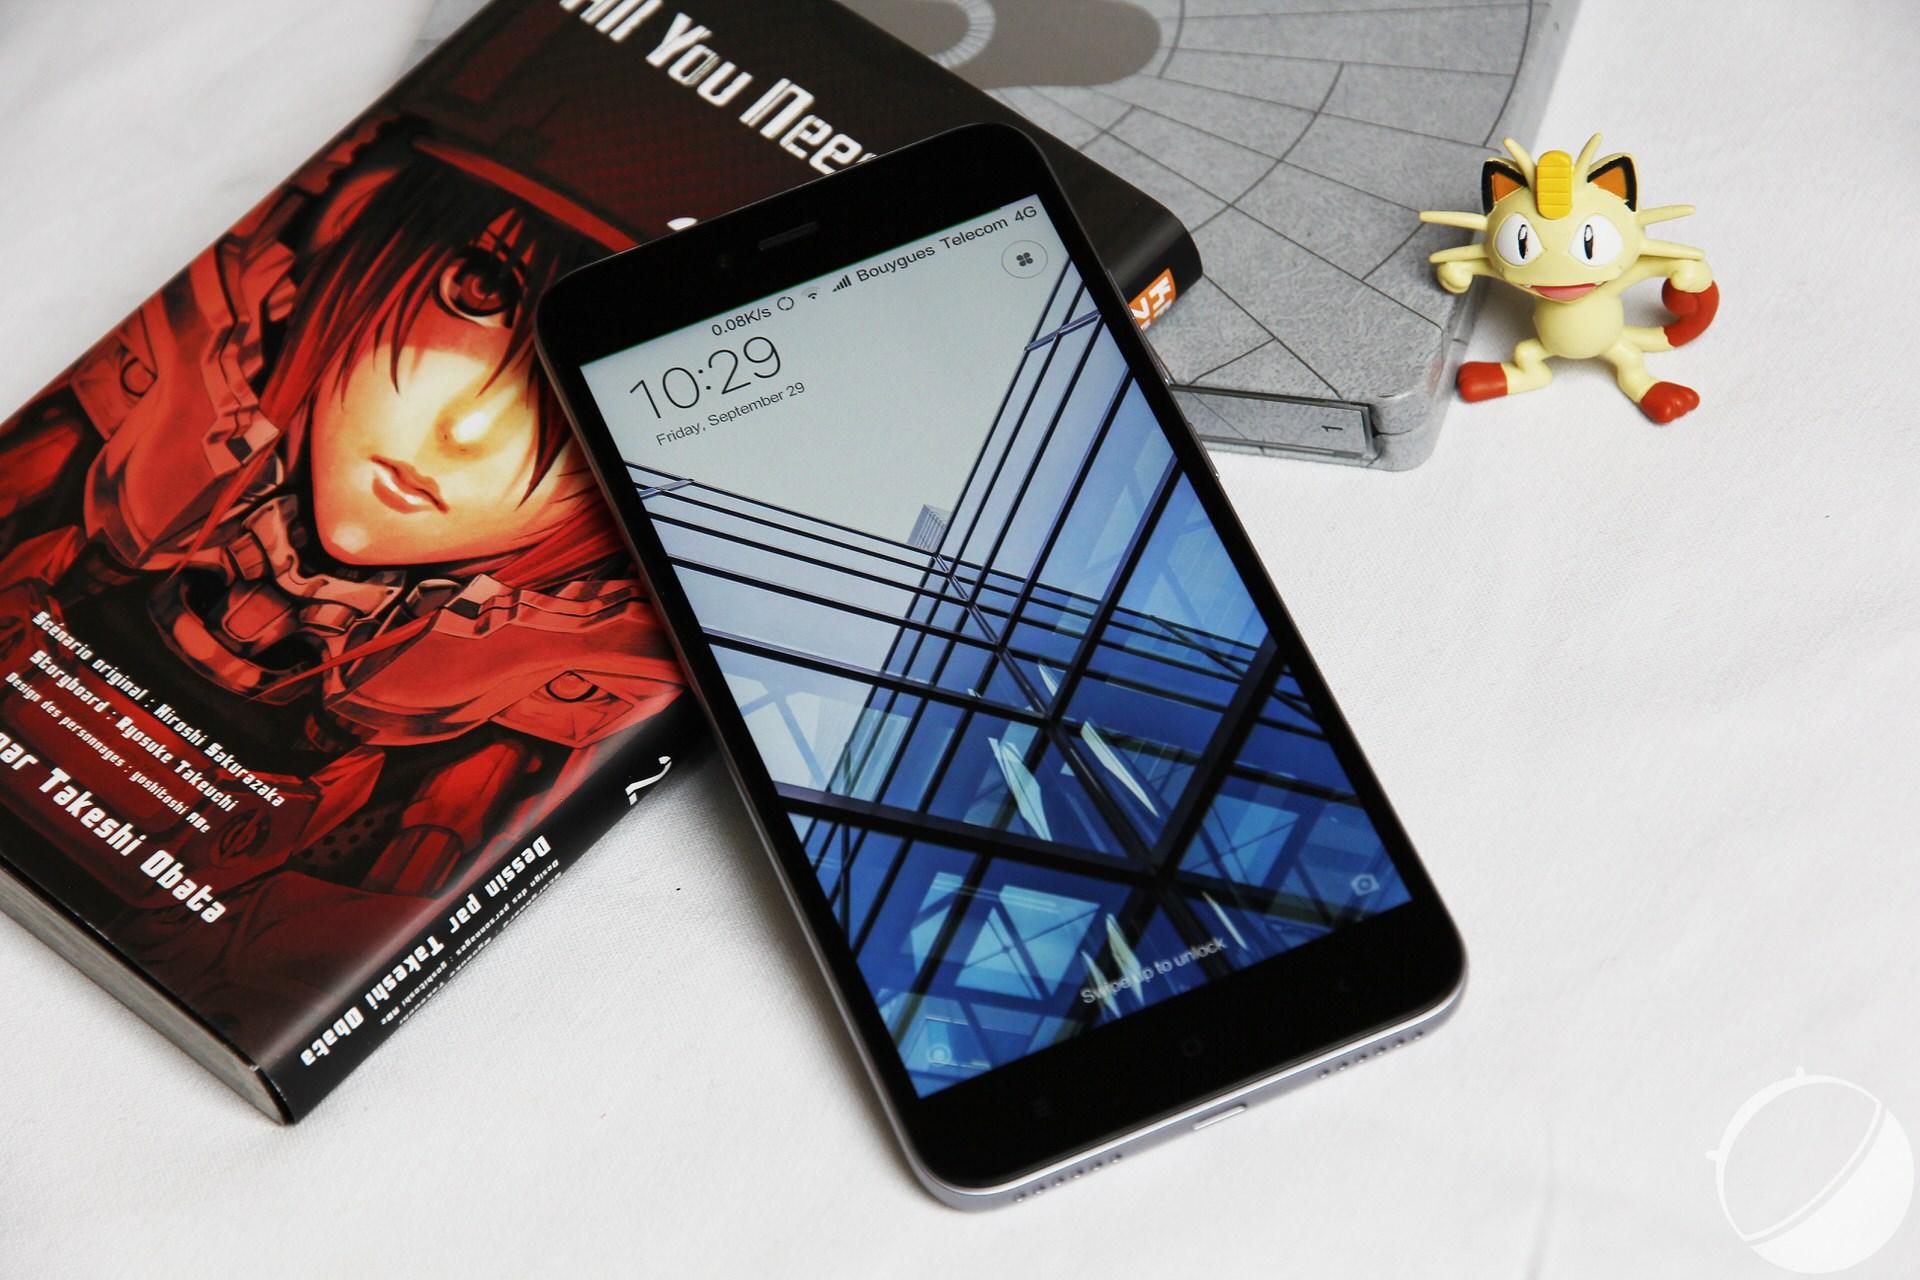 🔥 Bon plan : le Xiaomi Redmi 5A passe à 74 euros au lieu de 99 euros à sa sortie